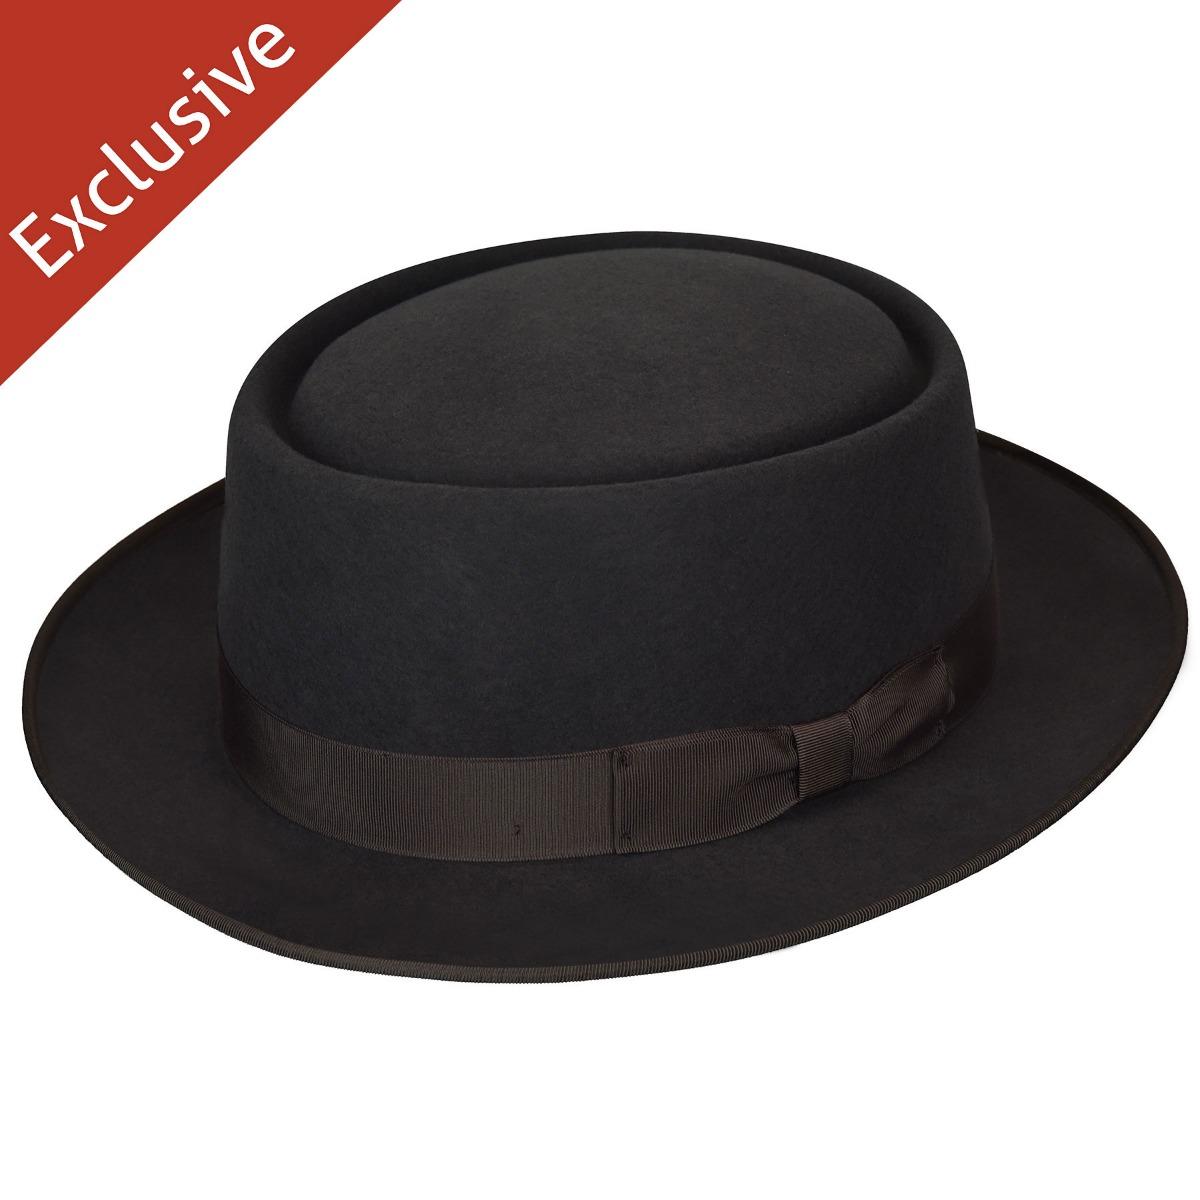 1940s Mens Hats | Fedora, Homburg, Pork Pie Hats Danger Pork Pie - Exclusive $39.99 AT vintagedancer.com